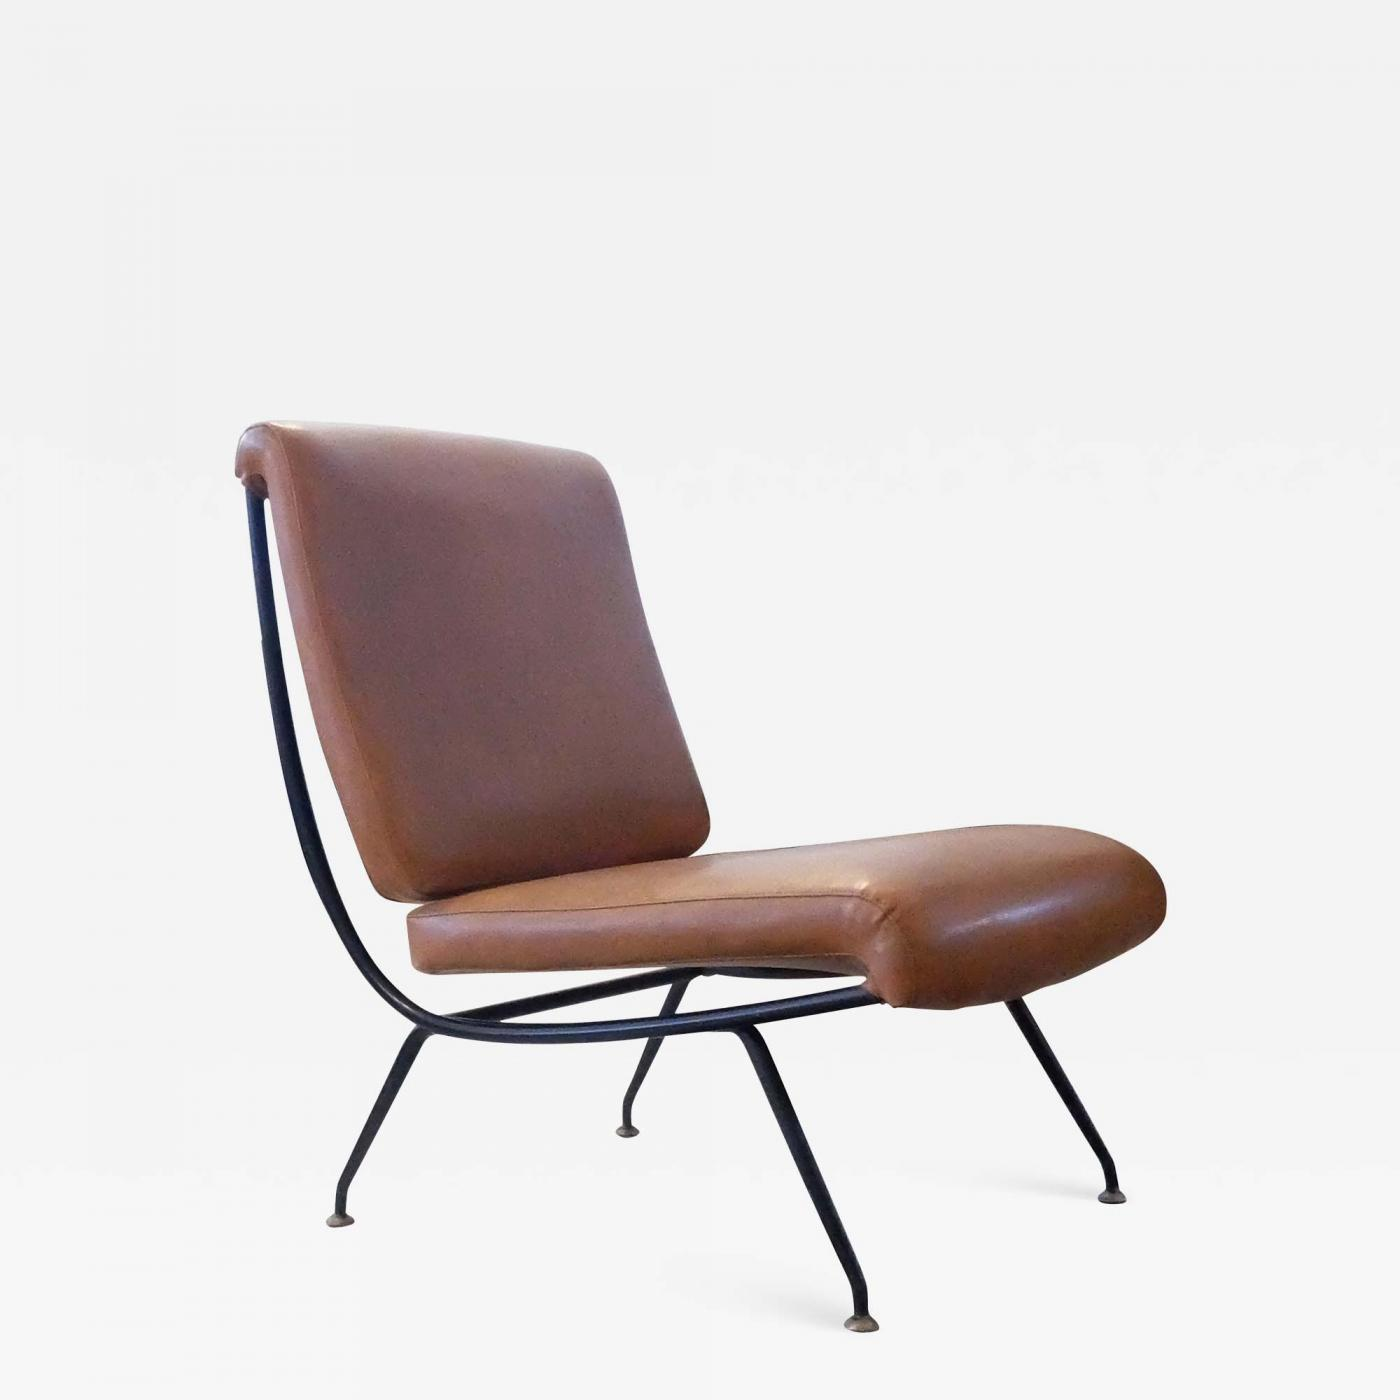 Admirable Gastone Rinaldi Gastone Rinaldi For Rima Italian Mid Century Modern Du 24 Brown Armchair 1956 Bralicious Painted Fabric Chair Ideas Braliciousco